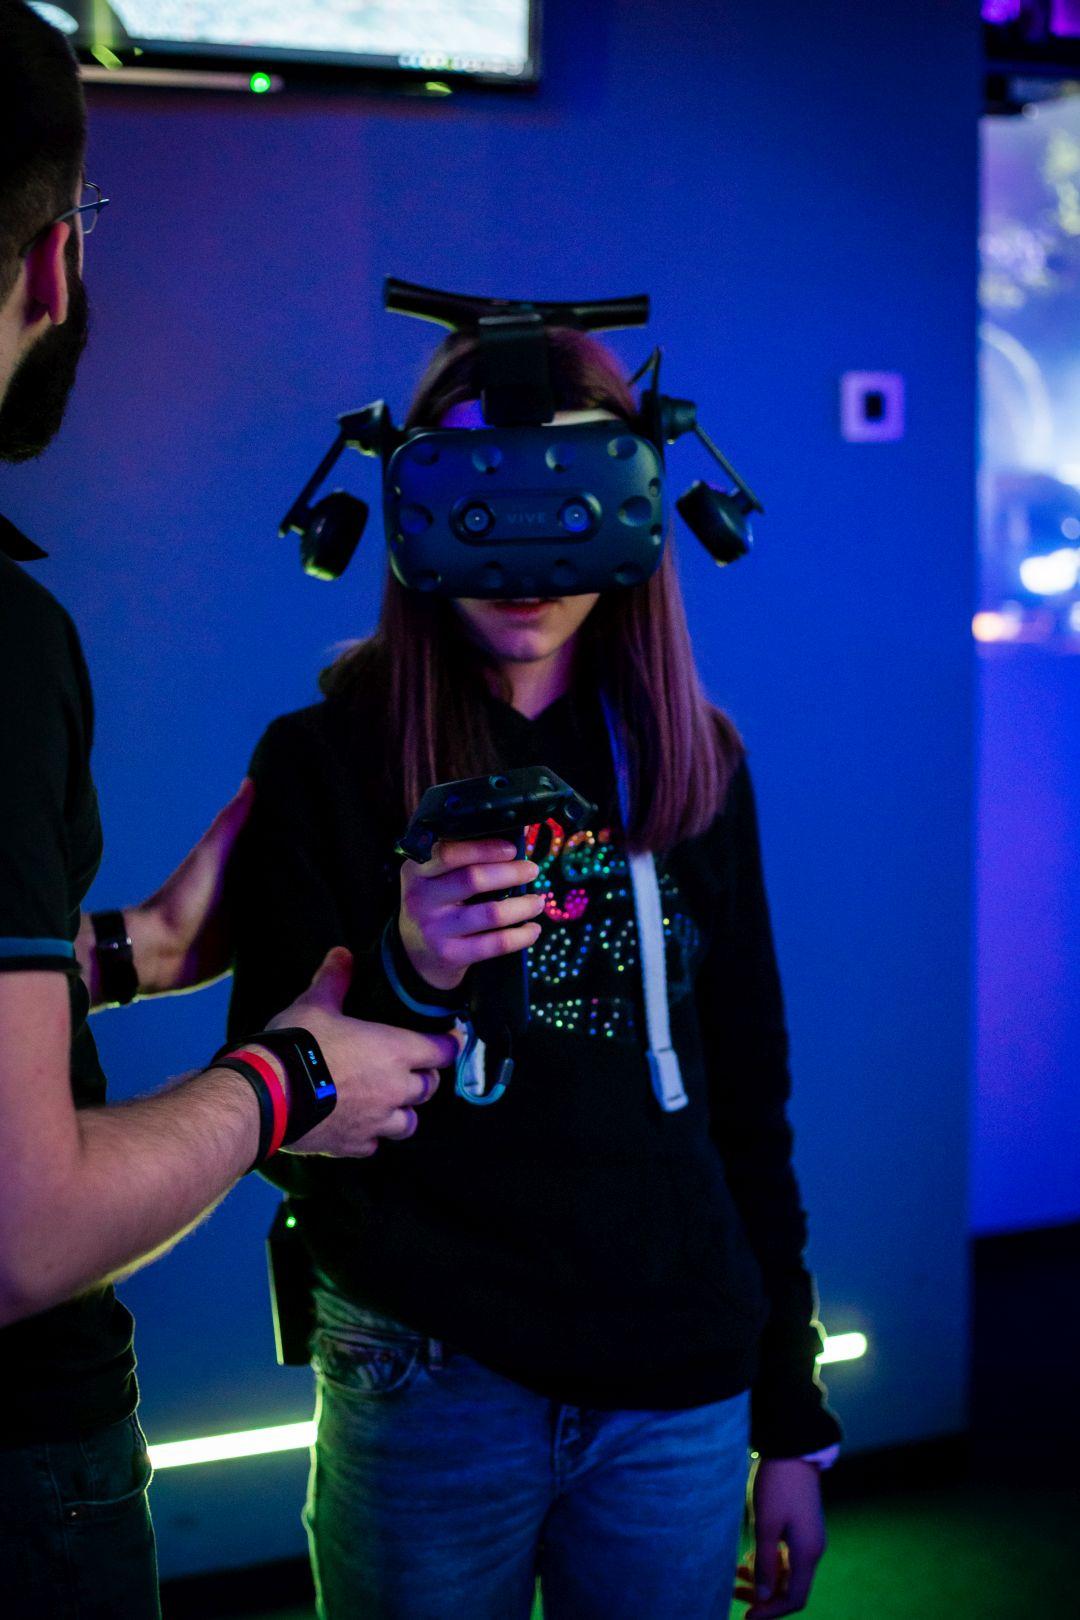 Rodjendan-Proslava-VR-virtuelna realnost